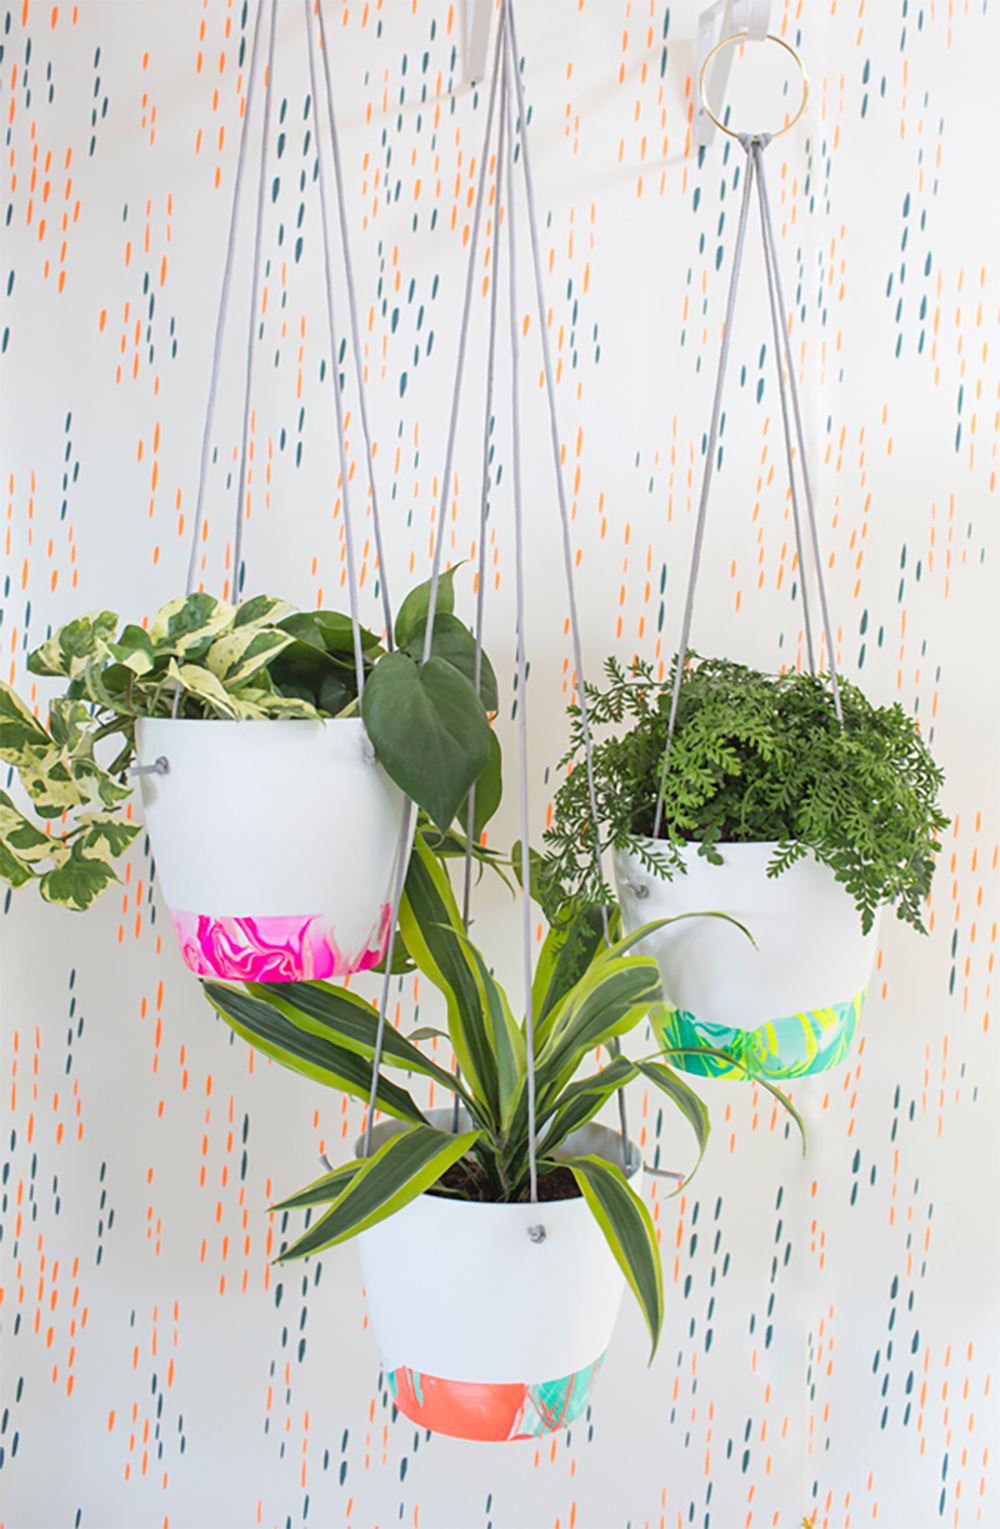 The perfect Christmas gift - DIY marbled planter | Aliz's Wonderland